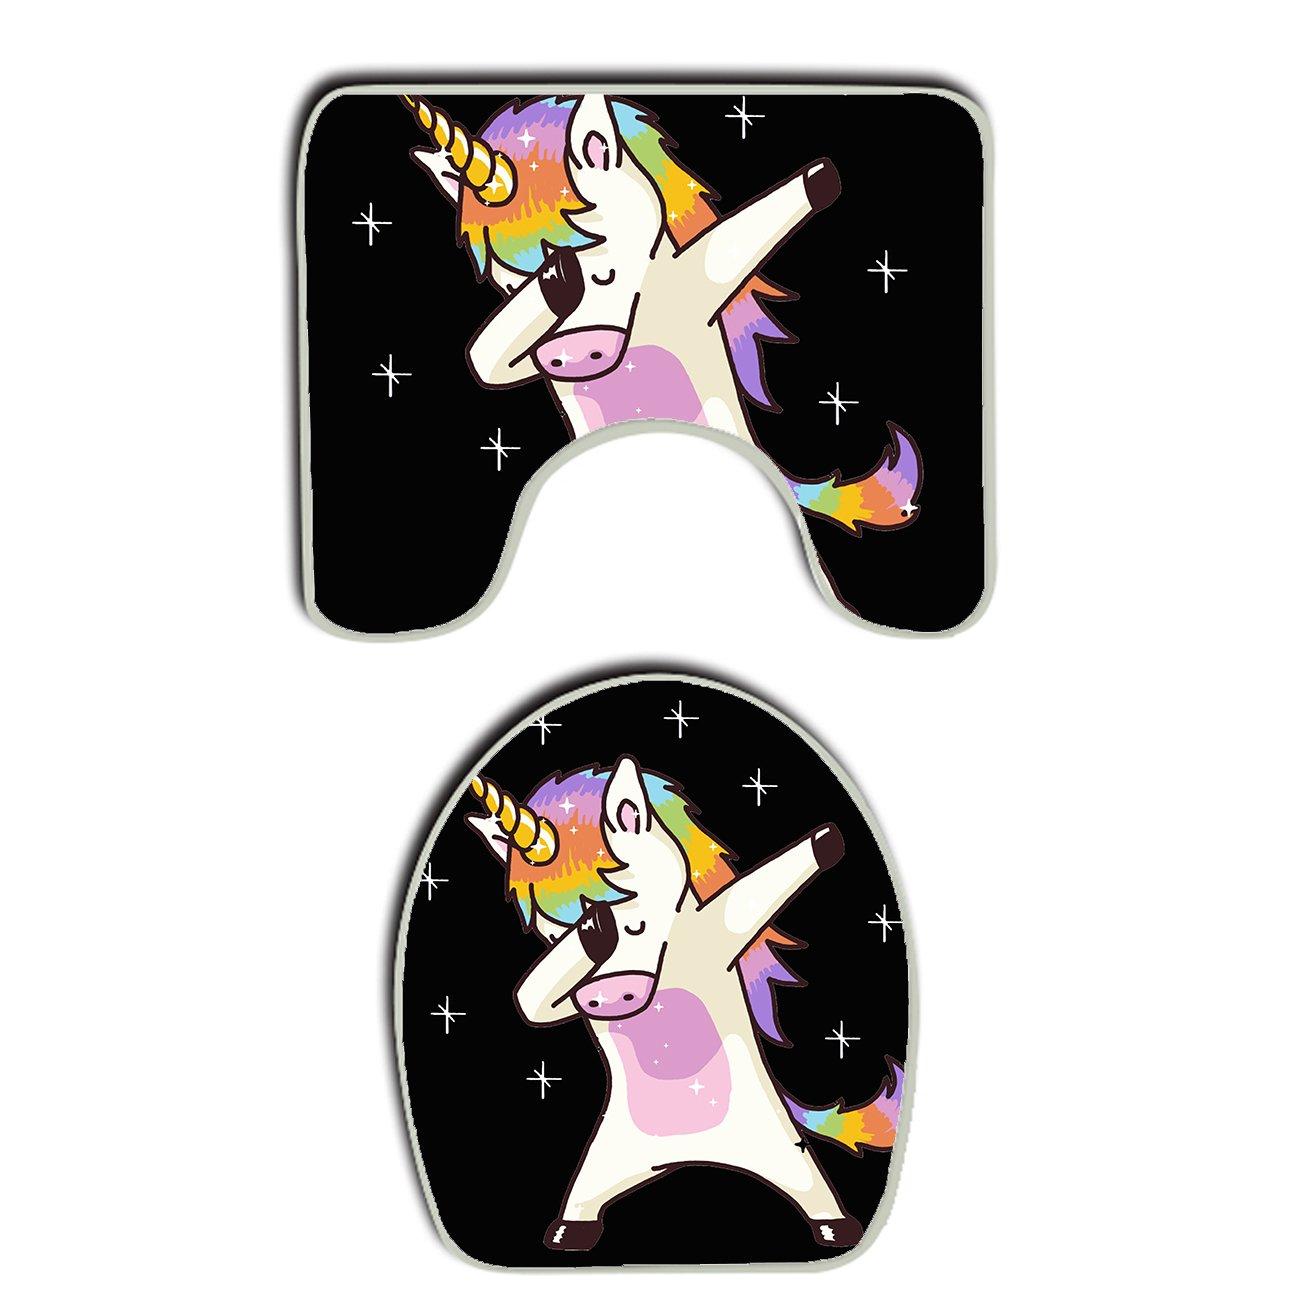 SWEET TANG Unicorn Cute Dabbing Funny Dab Dance Gift 2 Piece Set Soft Flannel Bathroom Rug U Contour Mat Lid Toilet Cover Non-slip